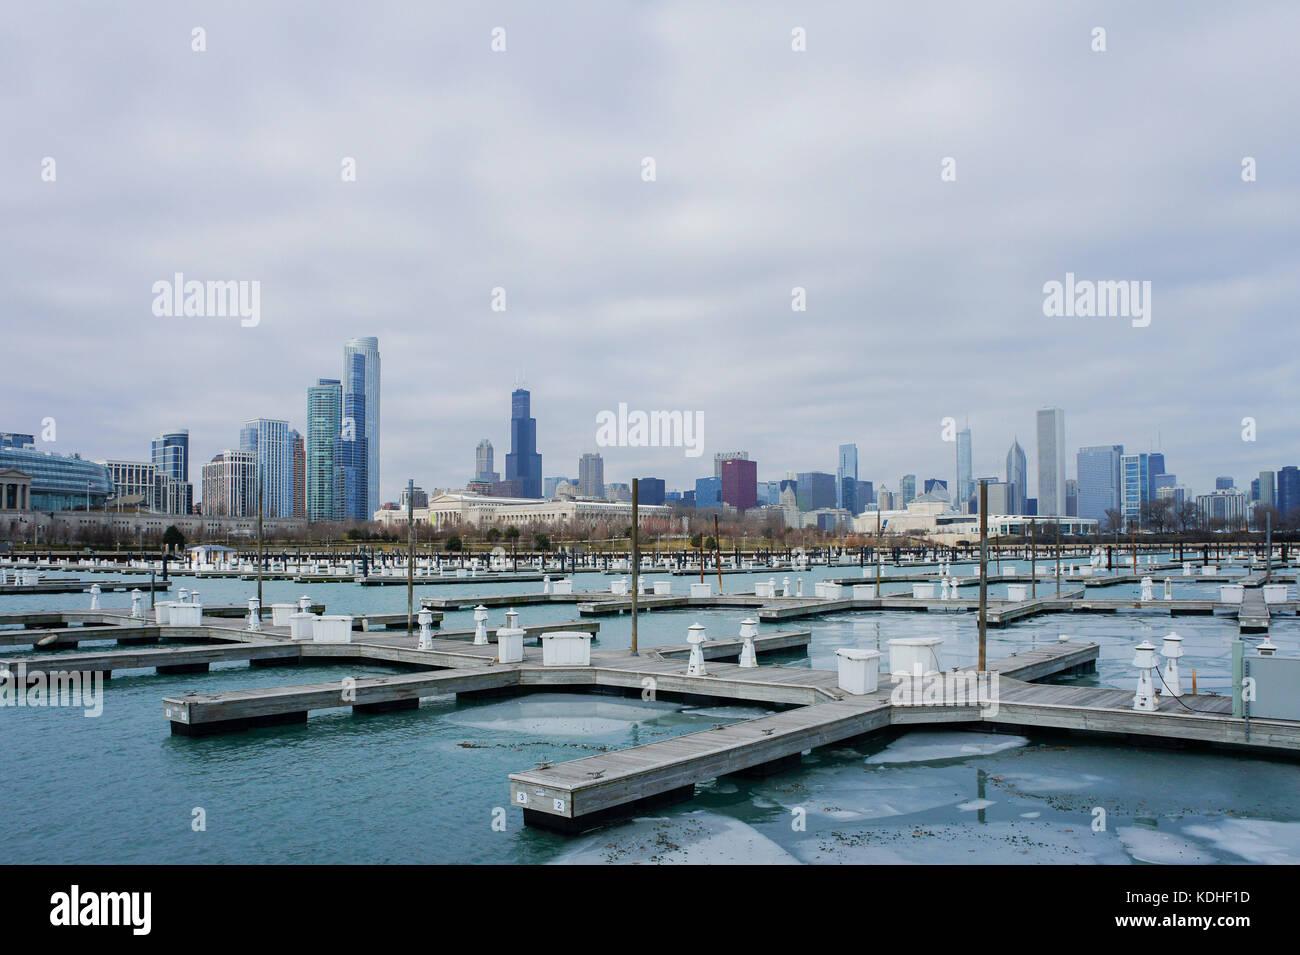 The beautiful DuSable Harbor at Millennium Park, Chicago, Illinois, United States - Stock Image